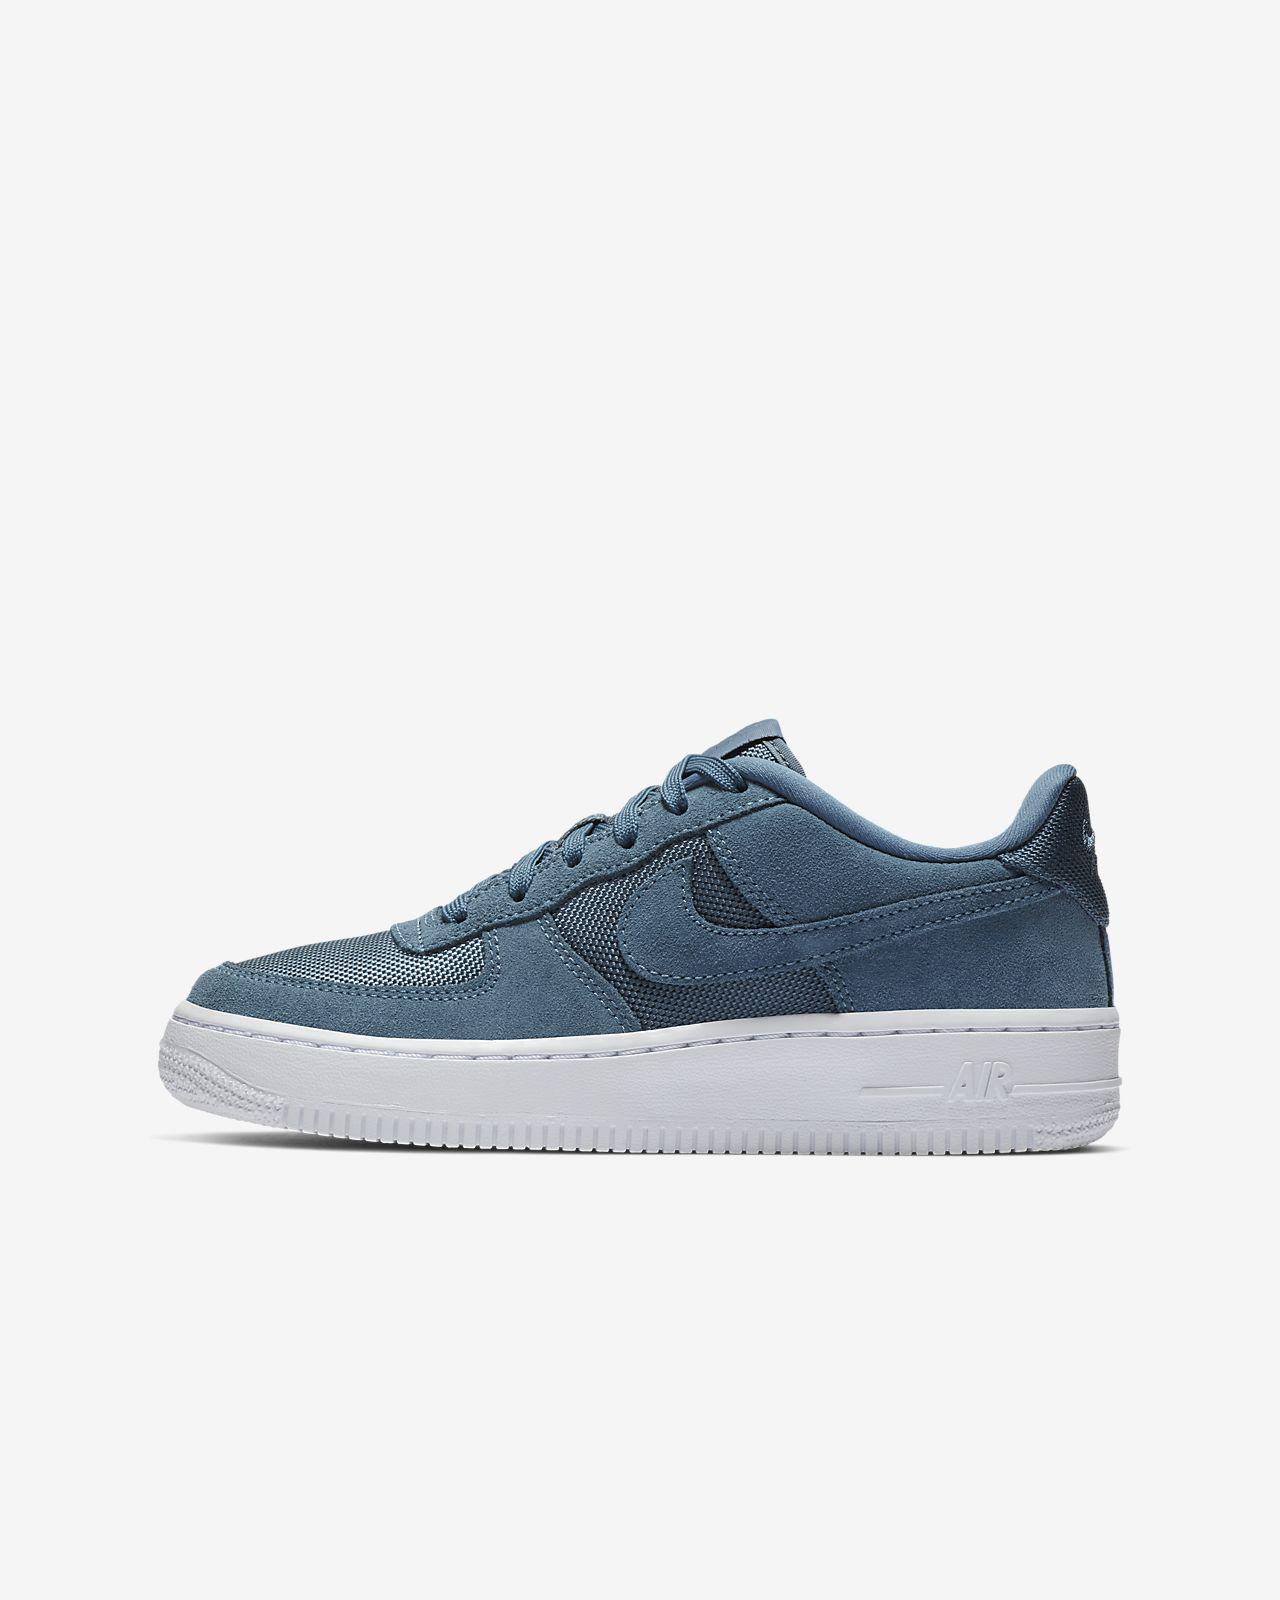 Nike Air Force 1-1-sko til store børn